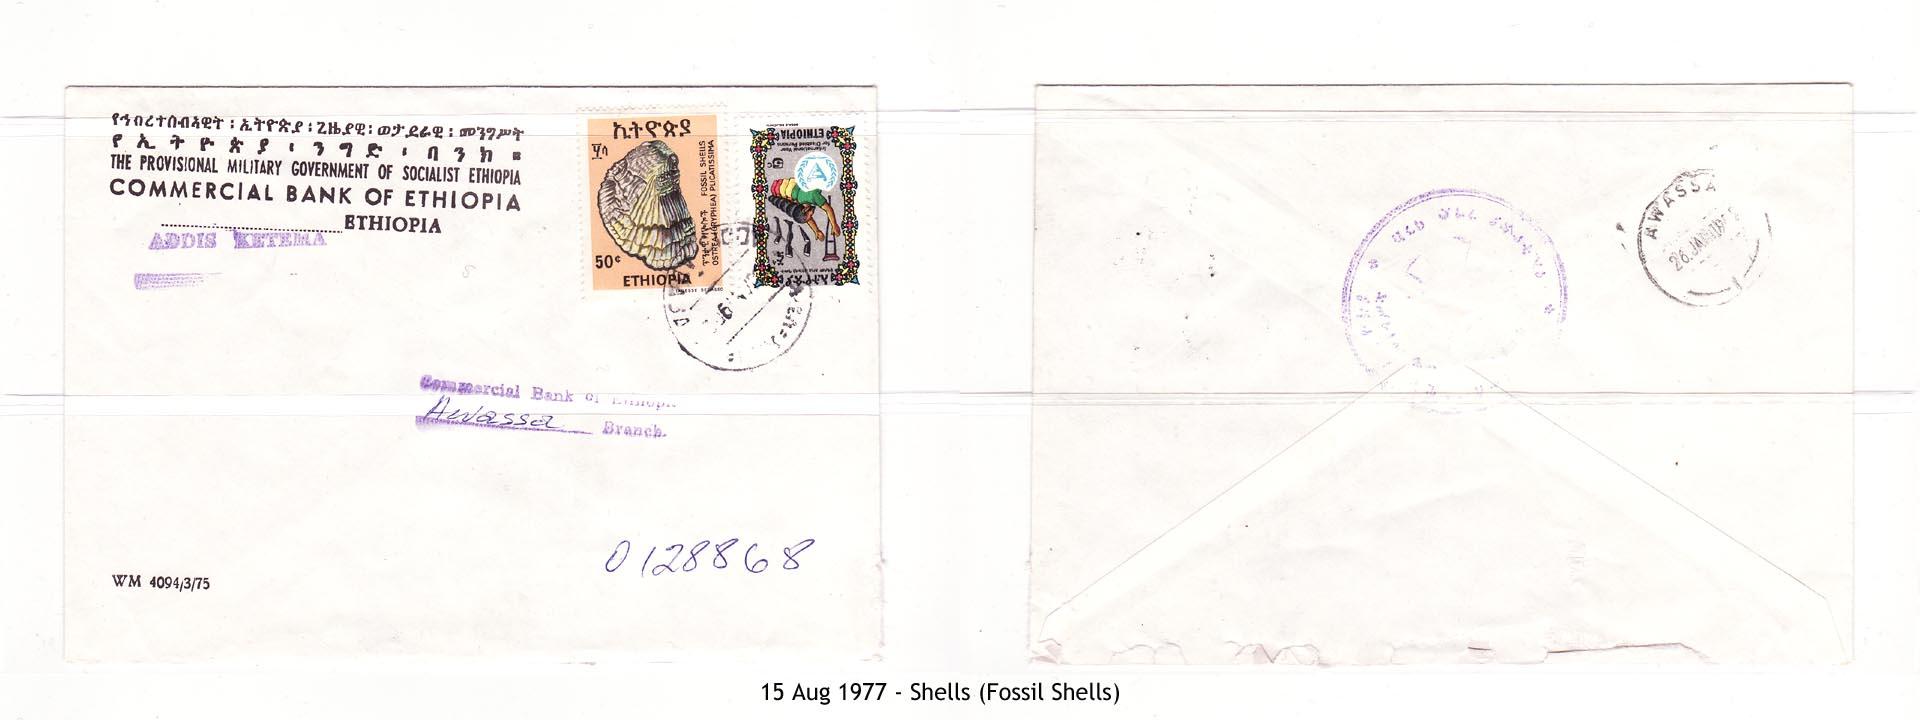 19770815 - Shells (Fossil Shells)